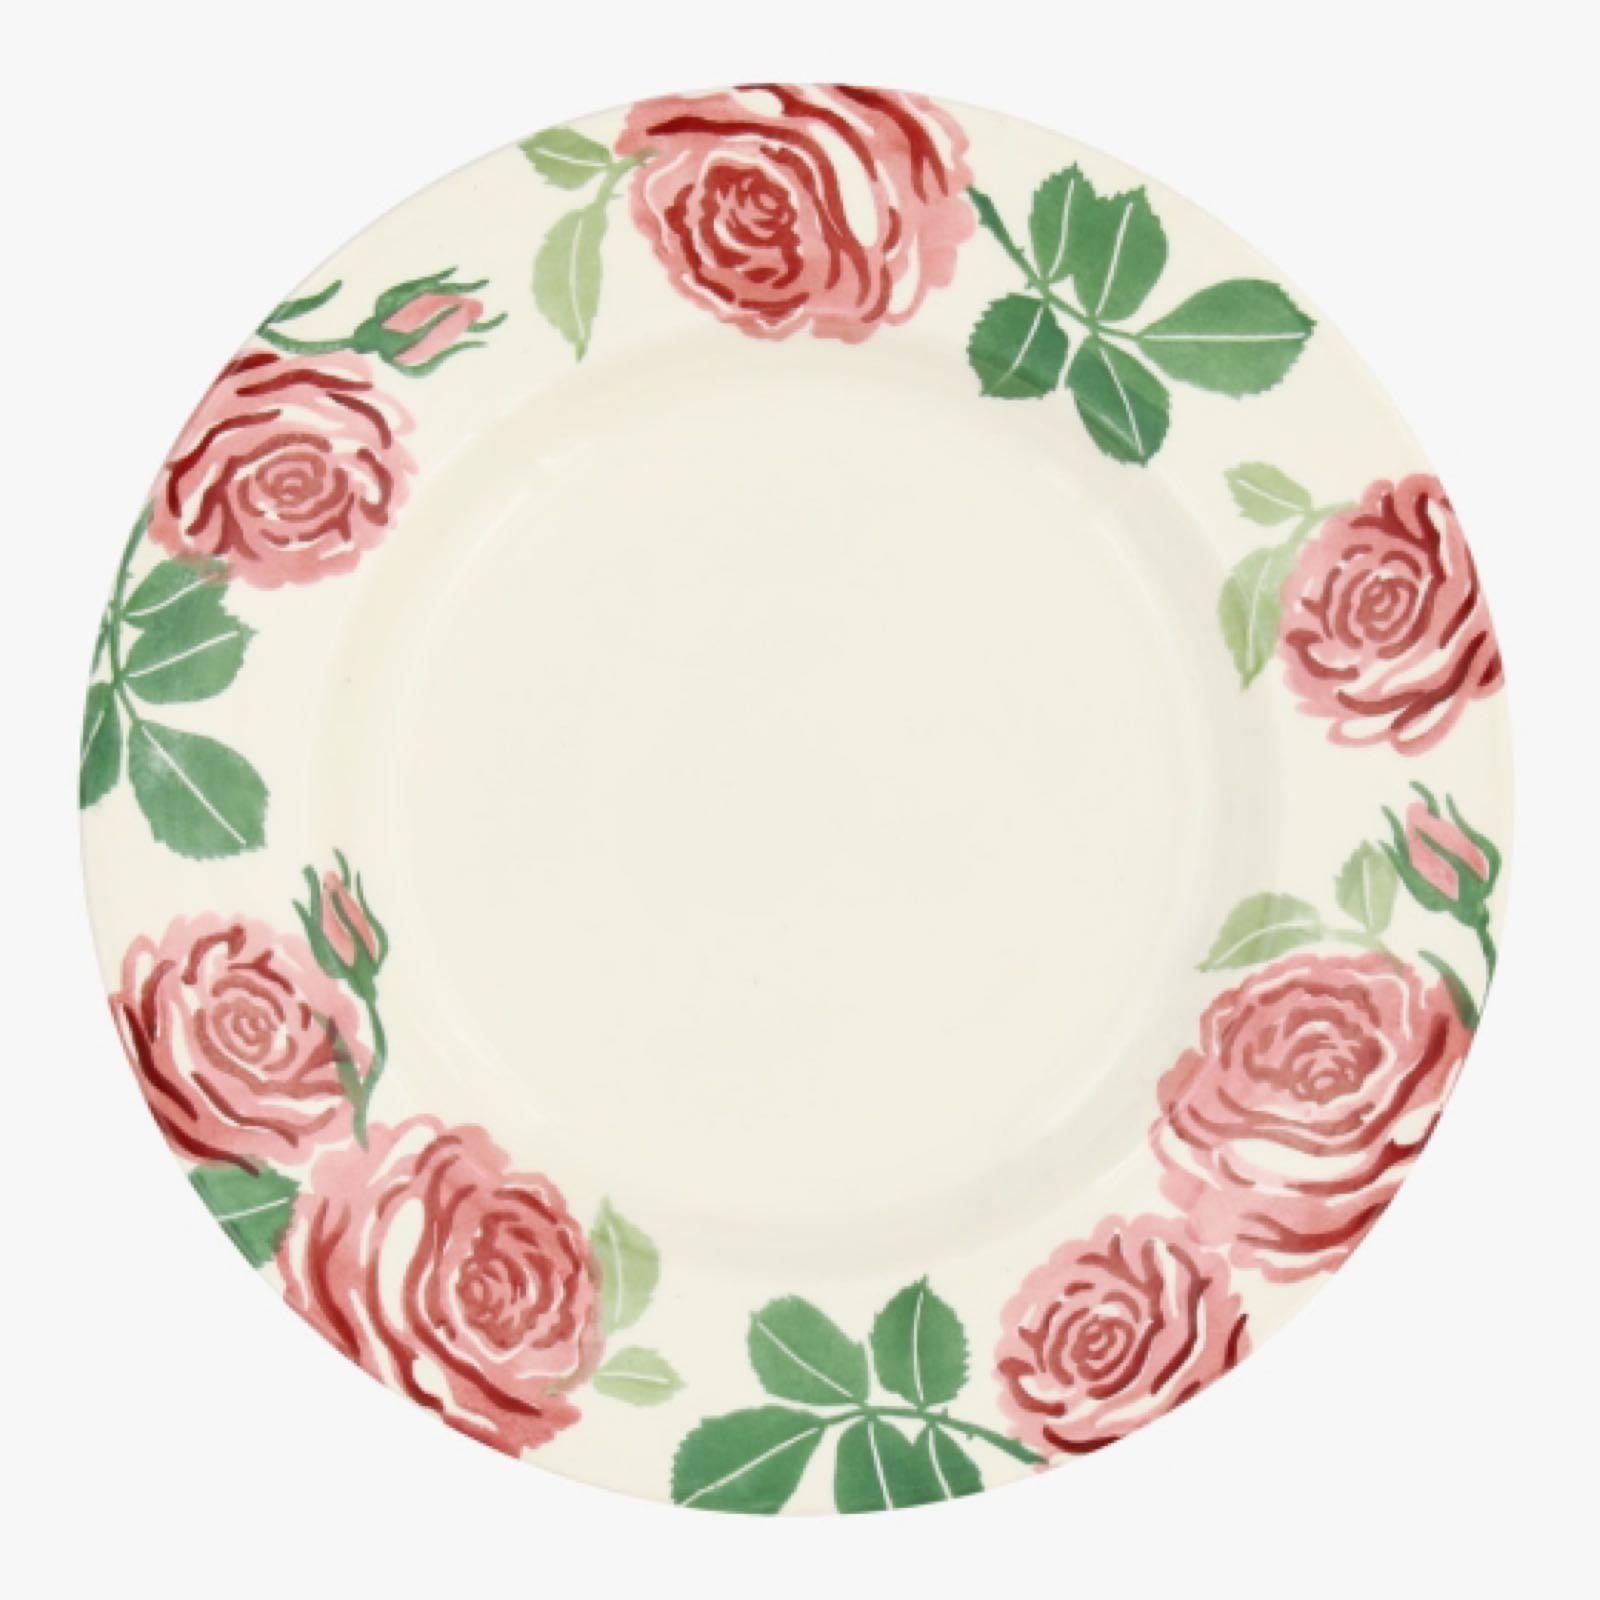 "Emma Bridgewater Pink Roses 8 1/2"" Plate"